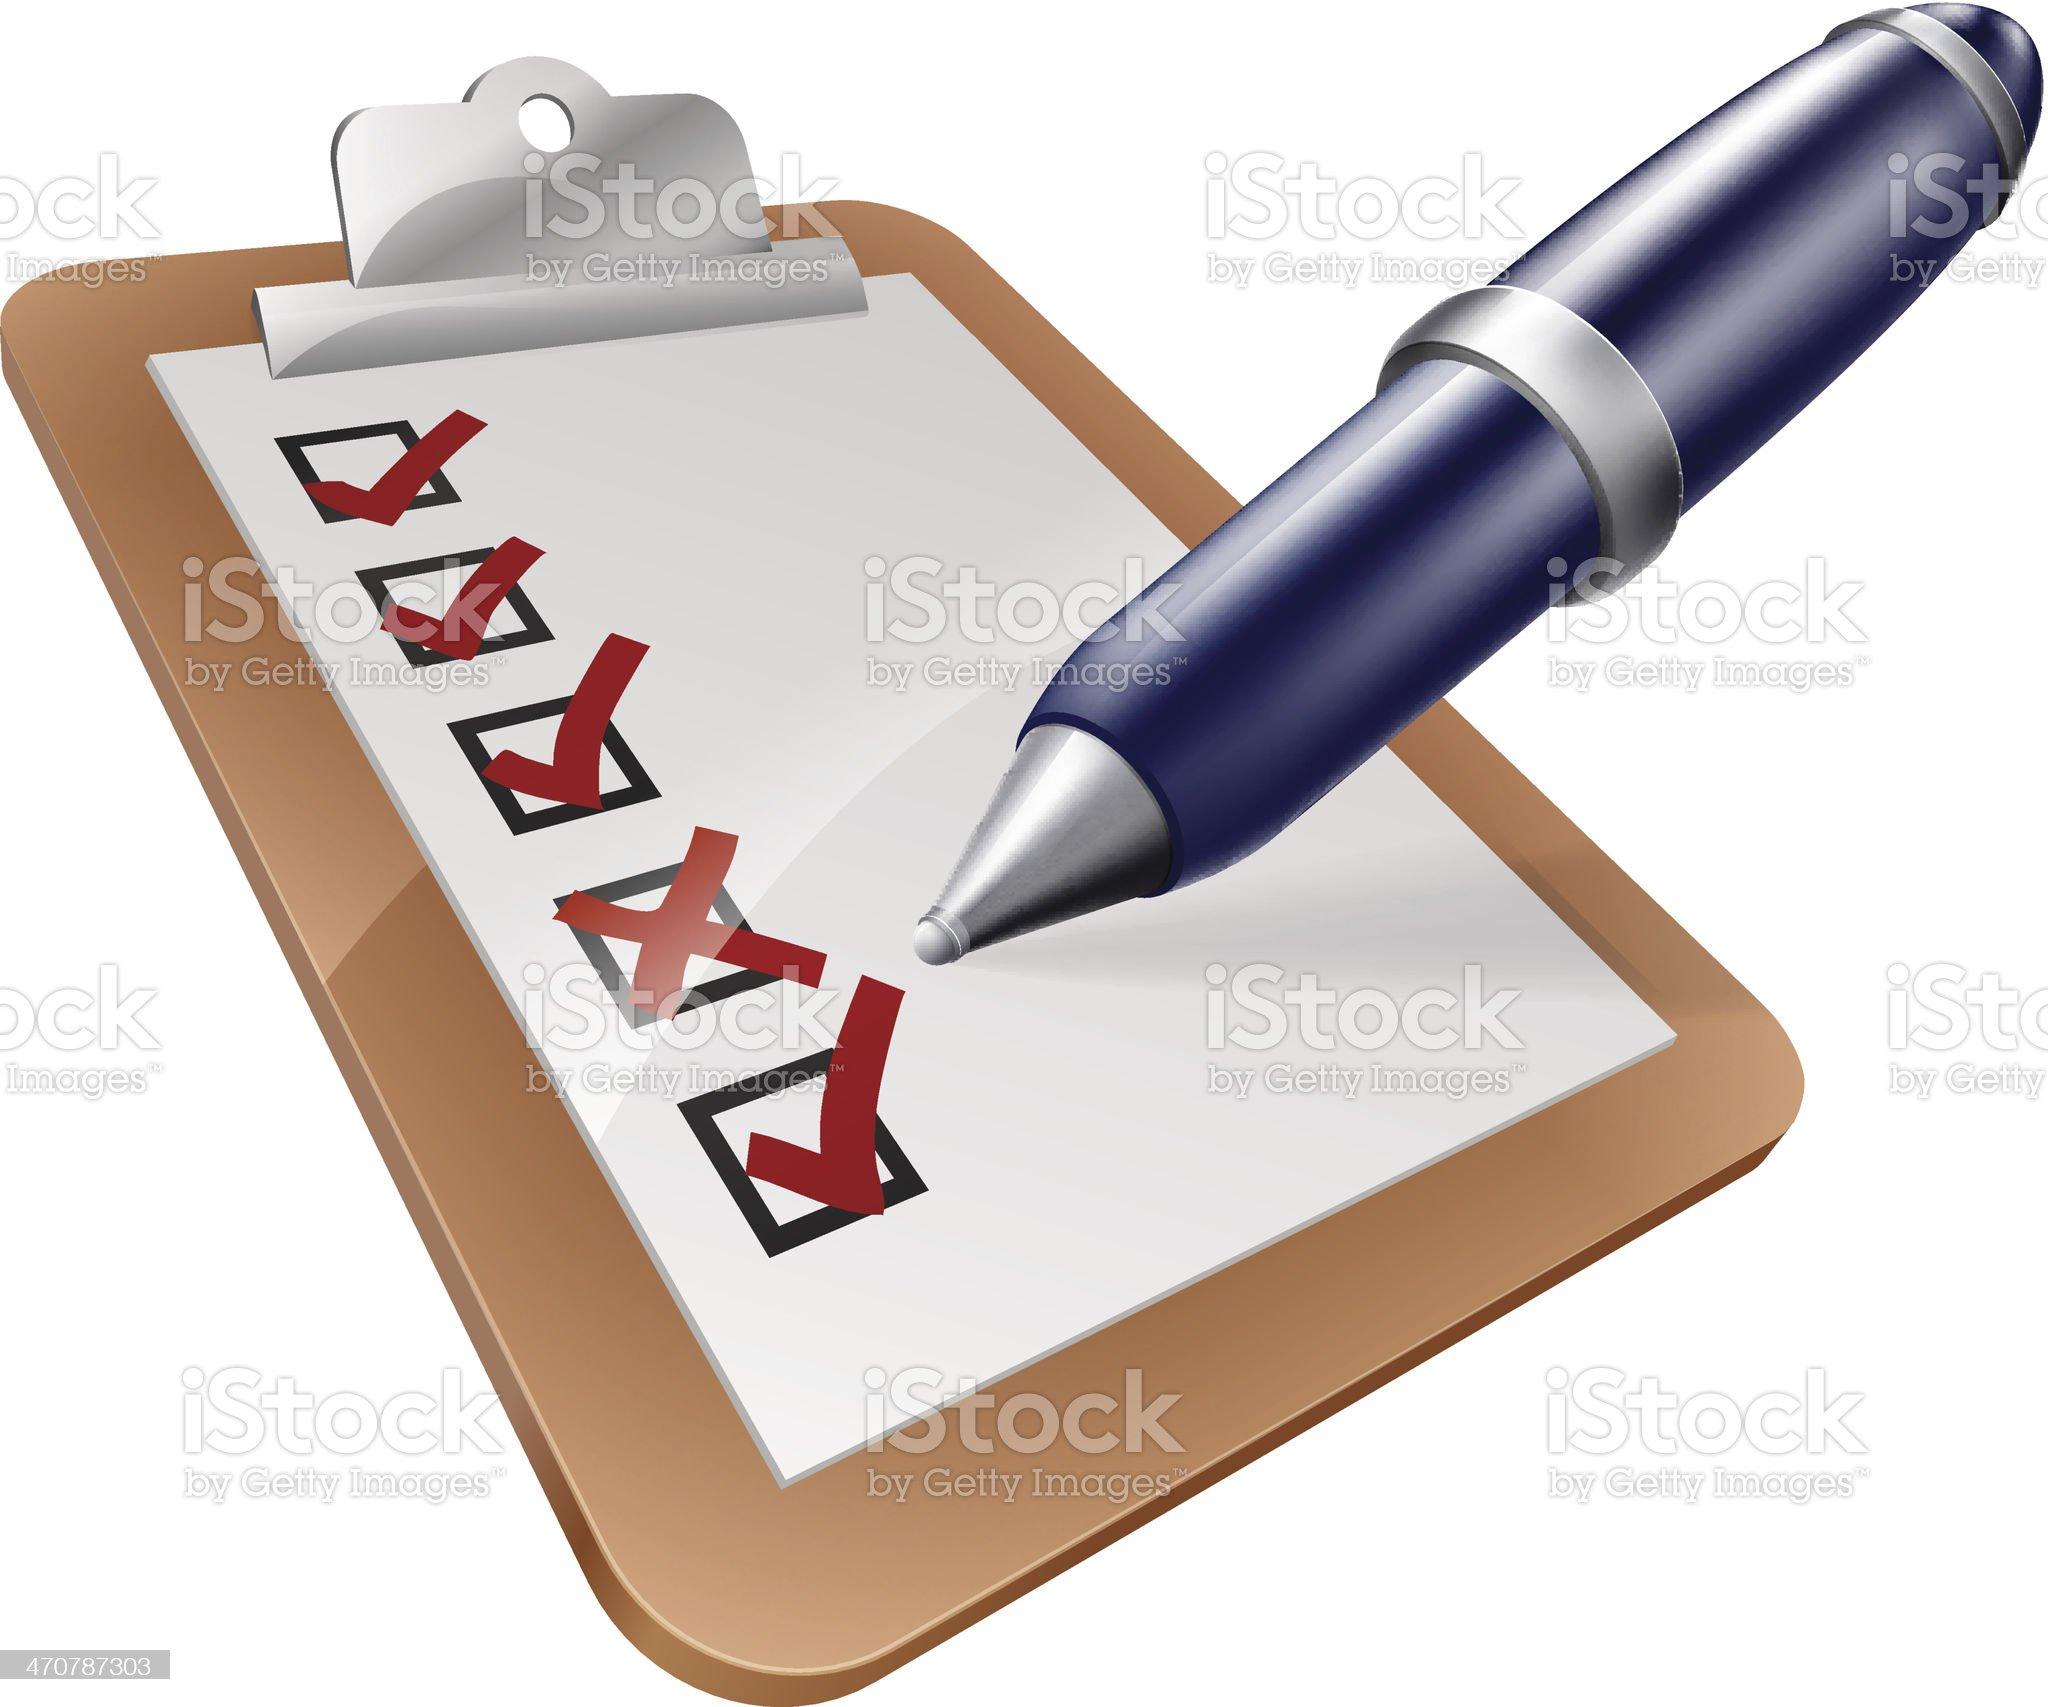 Survey clipboard and pen royalty-free stock vector art